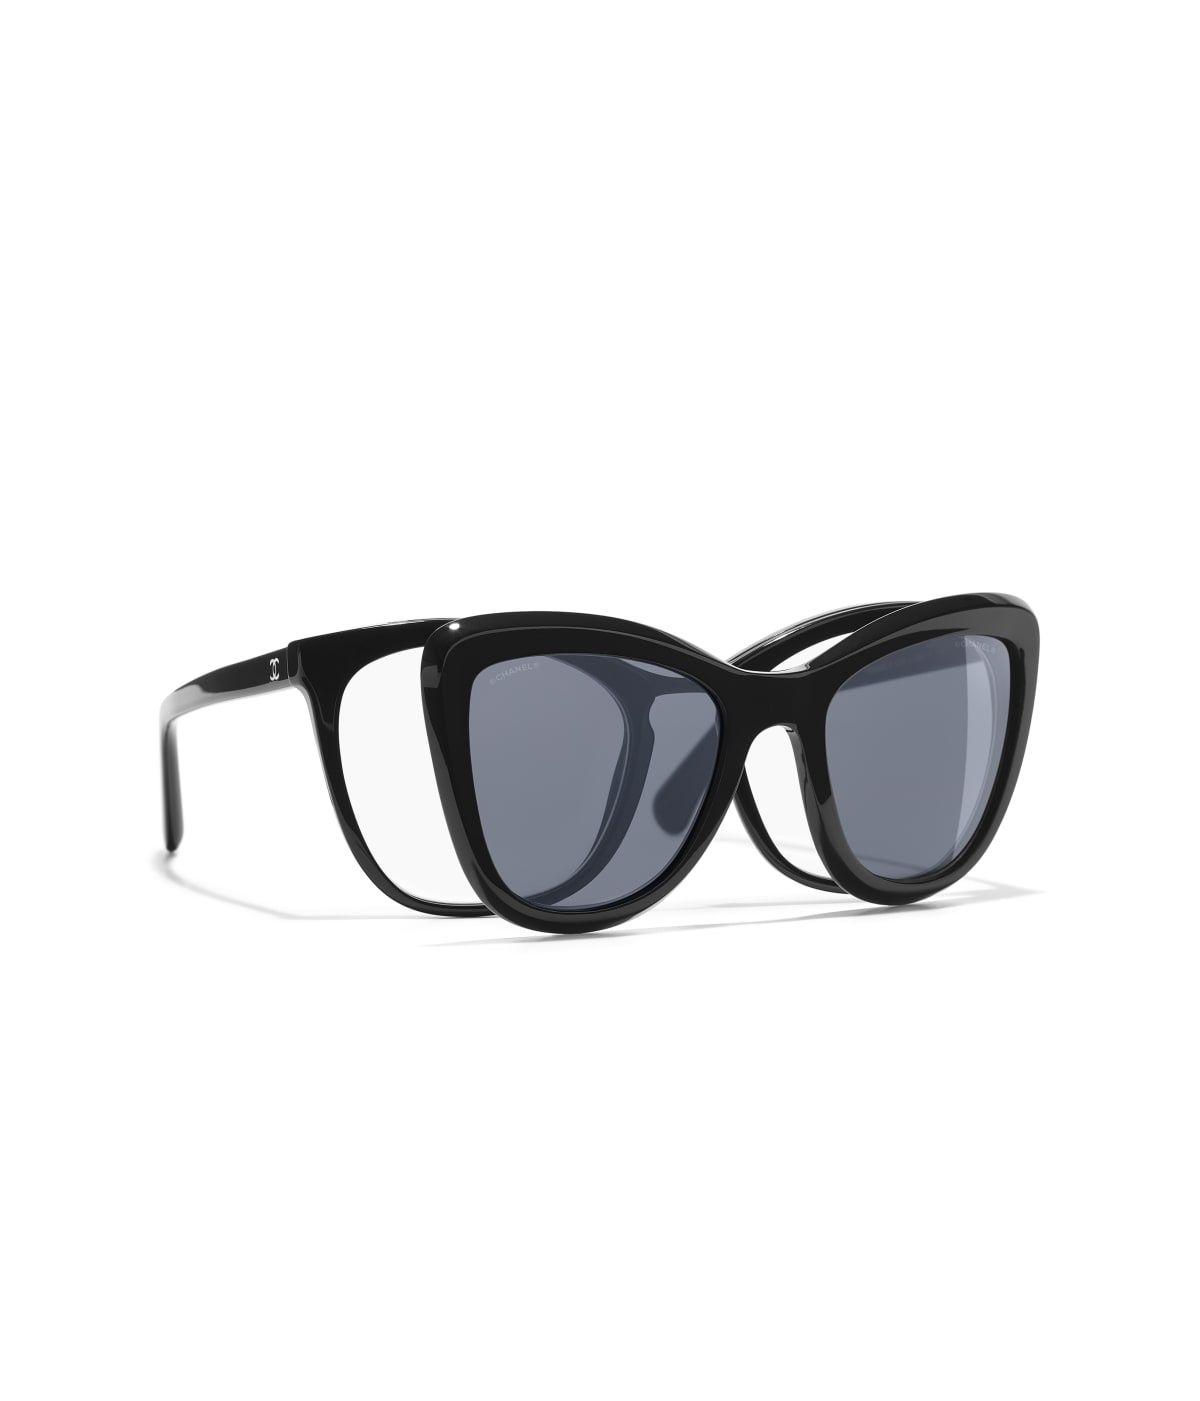 Las gafas de sol CHANEL   Gafas clip on 50ed86a7d04d